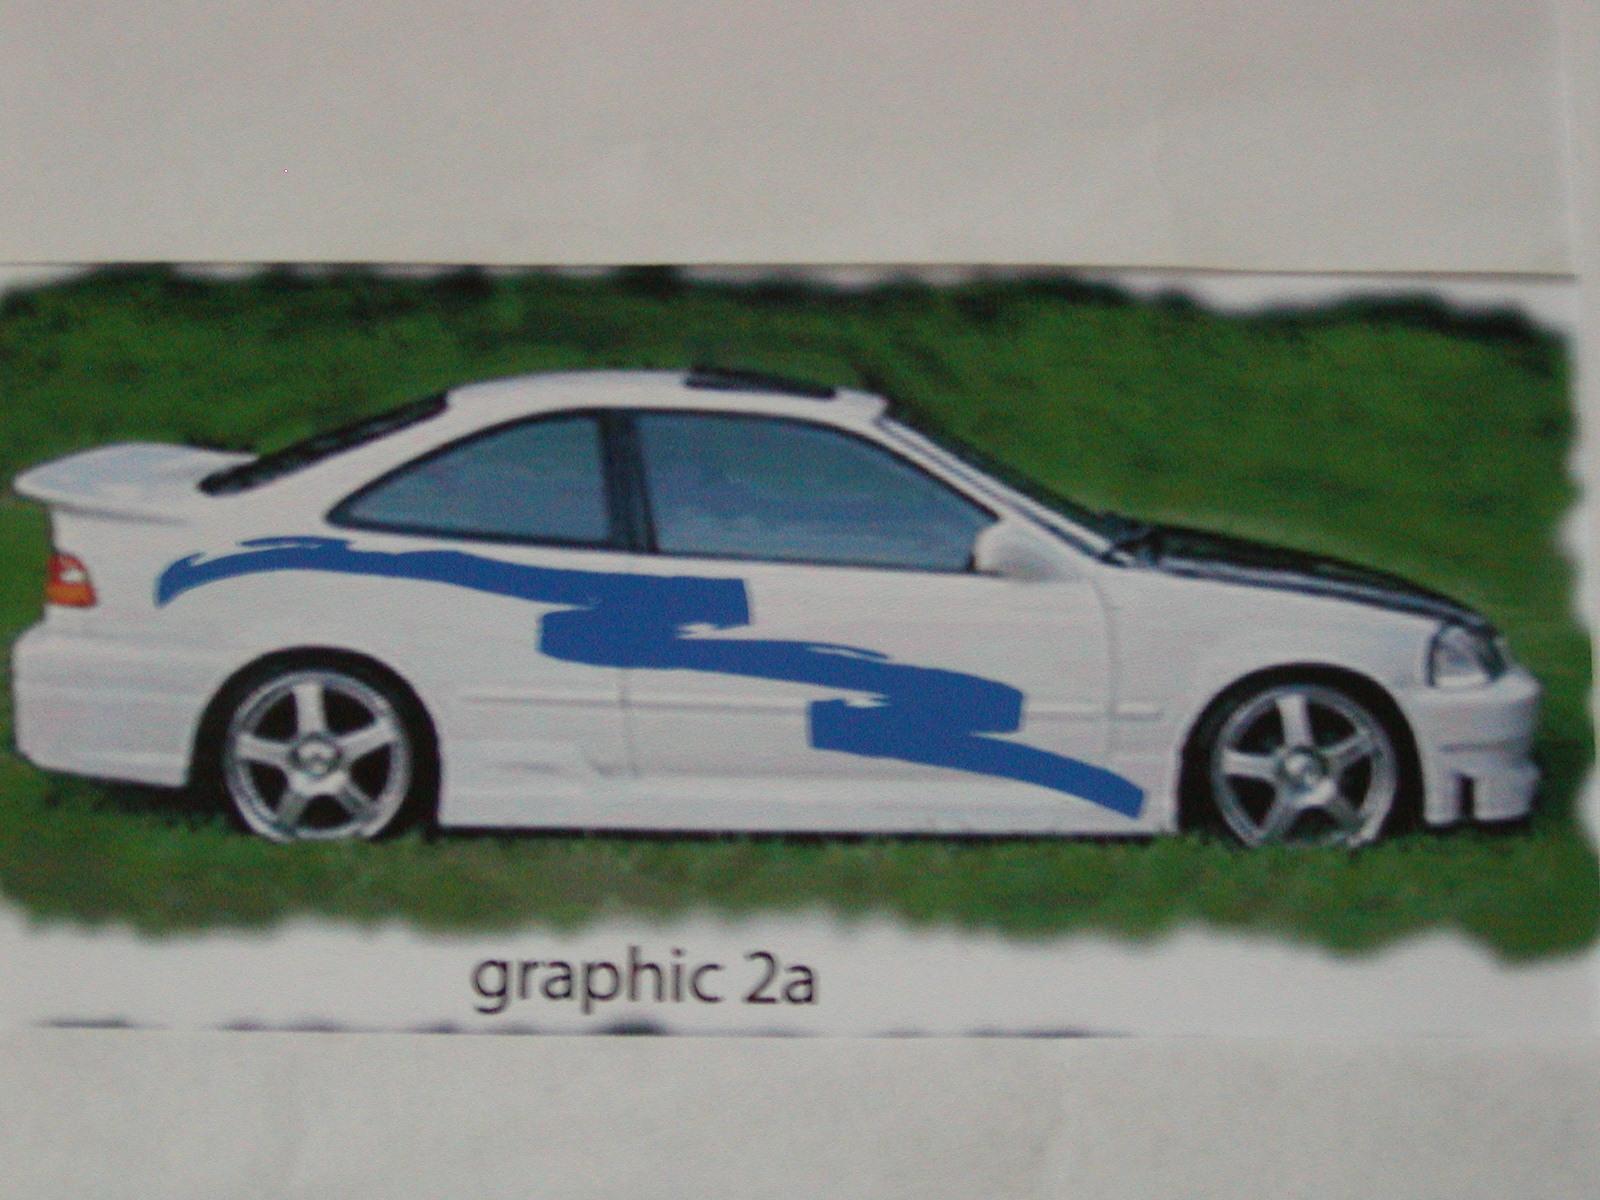 "�Graphics set 2a Size 22"" X 96"""